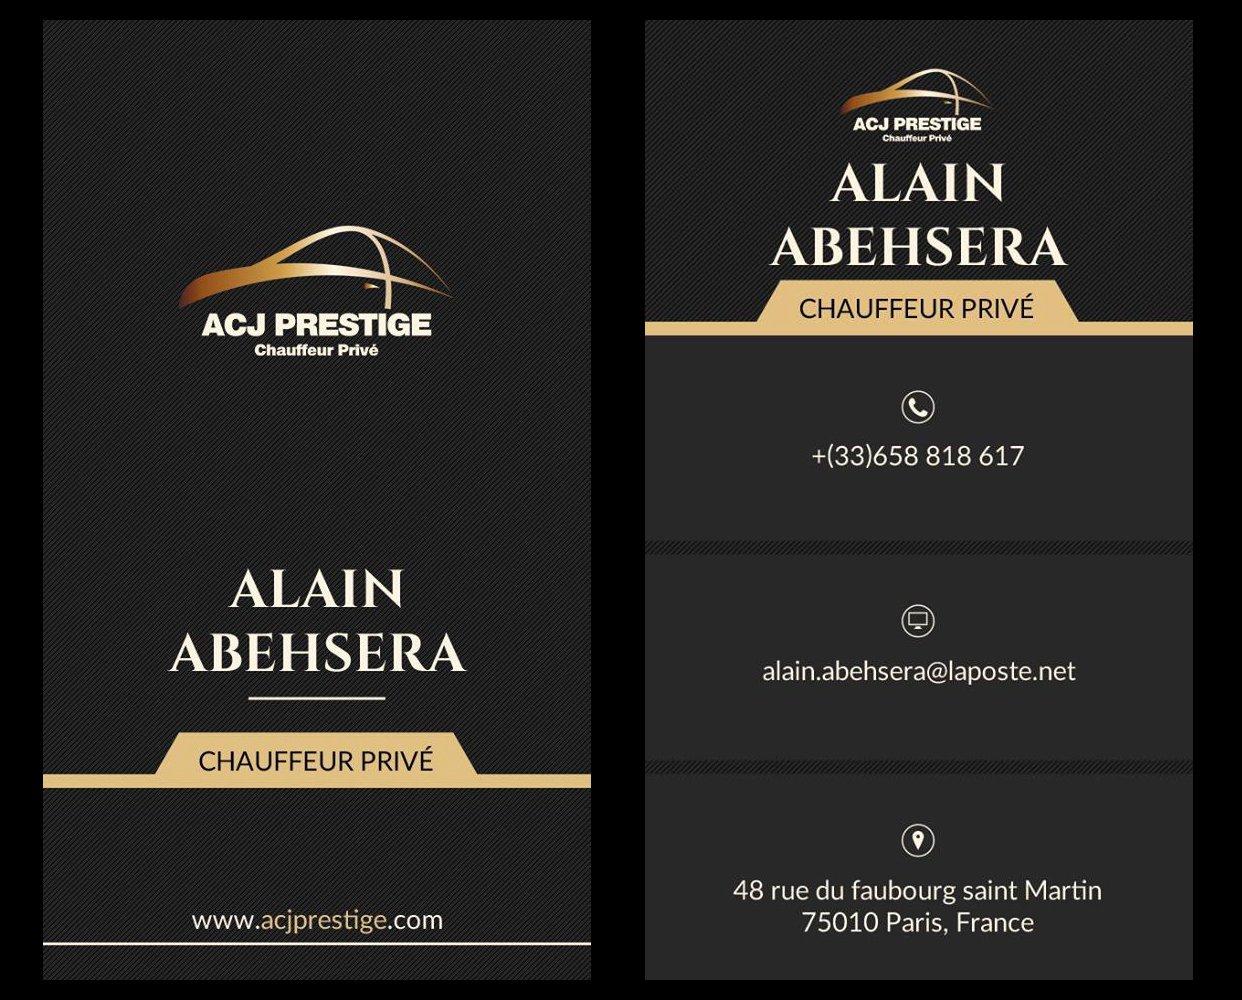 Acj Prestige Chauffeur privé Paris